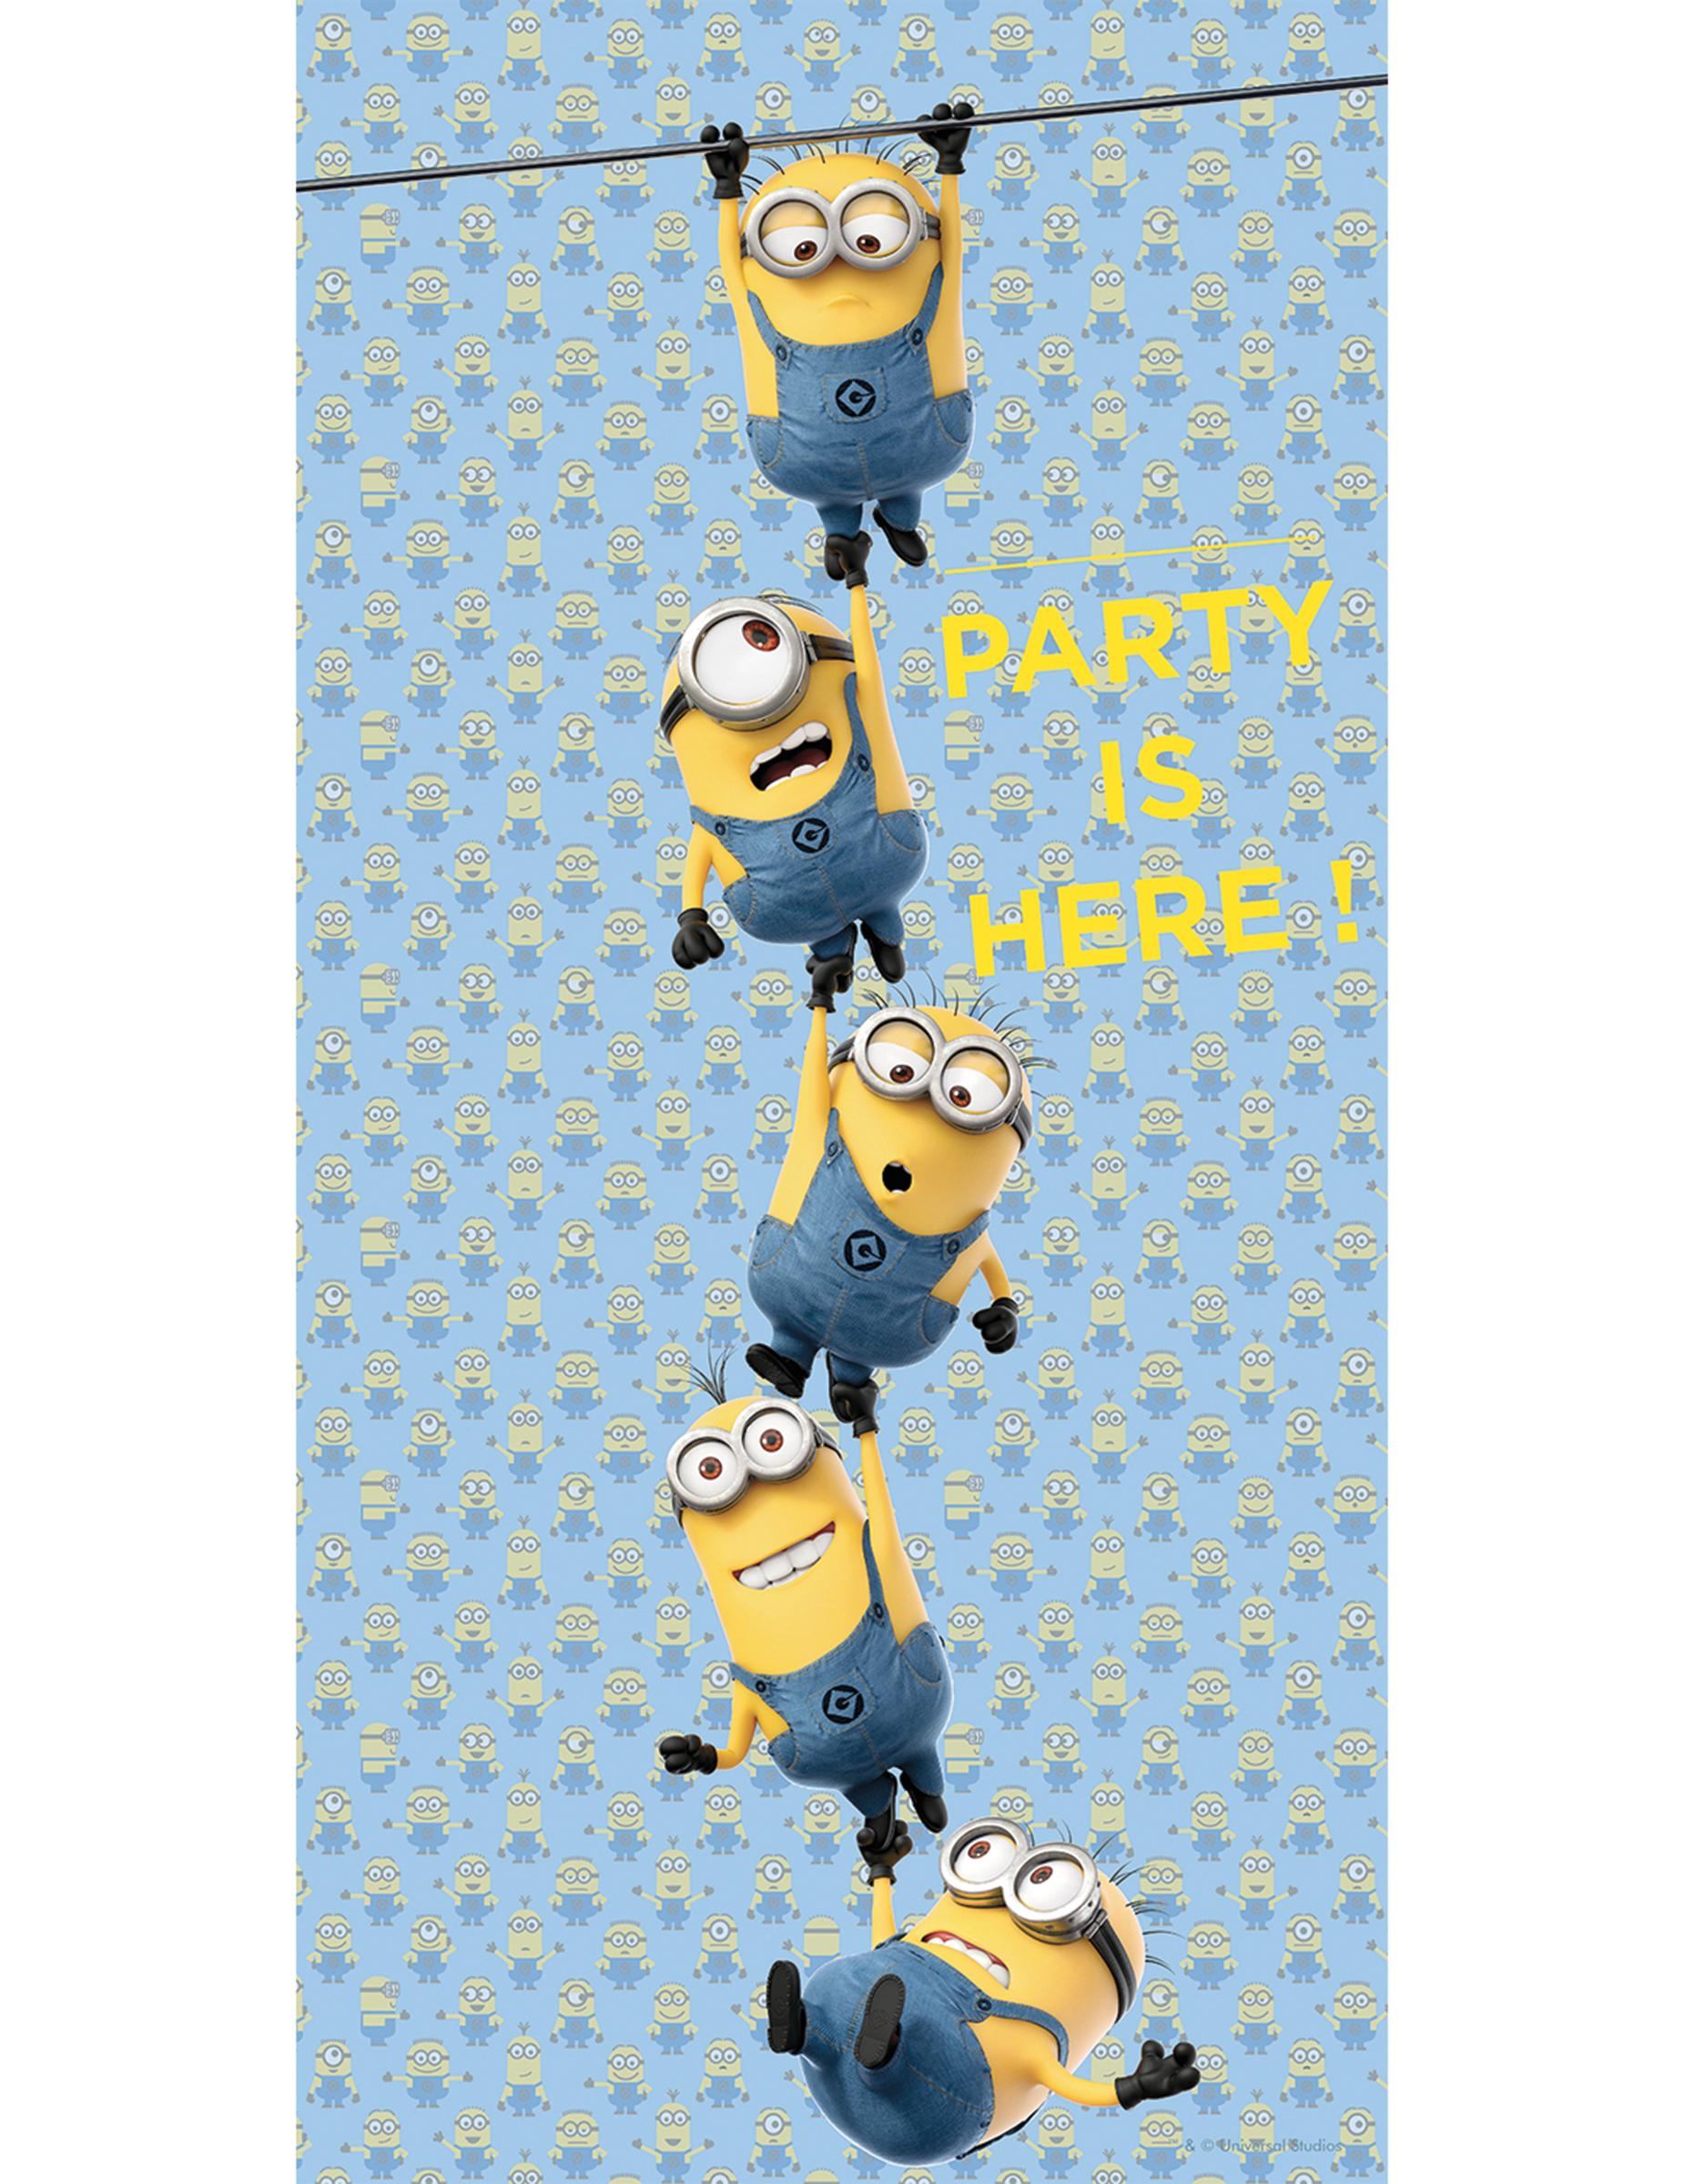 Poster t rdeko party lizenzartikel minions 75x150 cm g nstige faschings partydeko zubeh r - Halloween turdeko ...